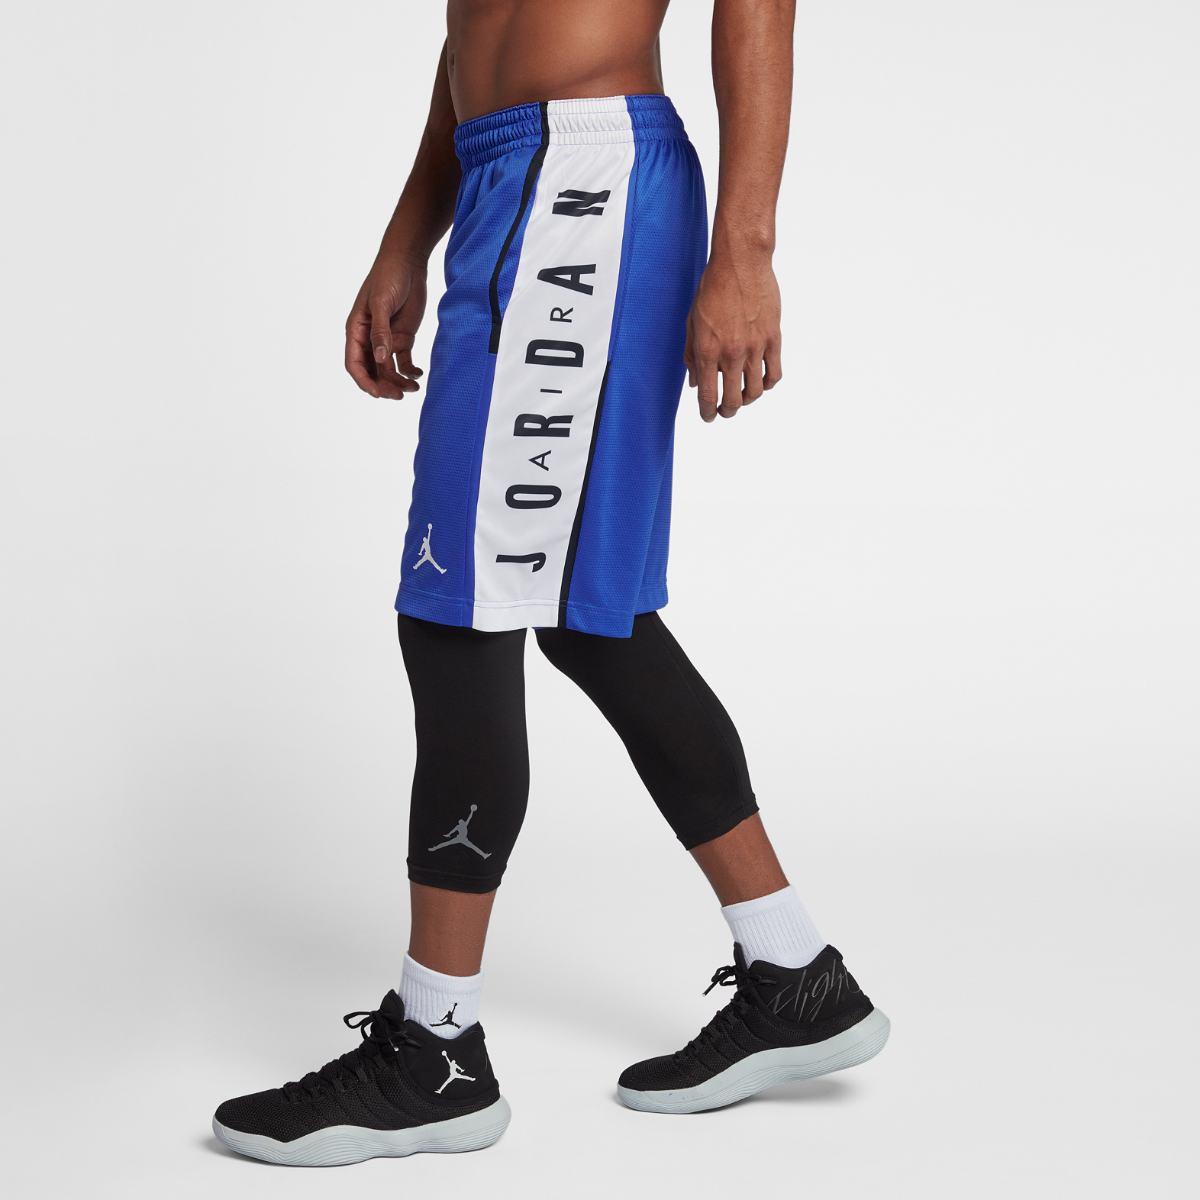 2d8f107f0109 Jordan Rise Graphic Shorts - SPORTING GOODS Basketball Shorts ...